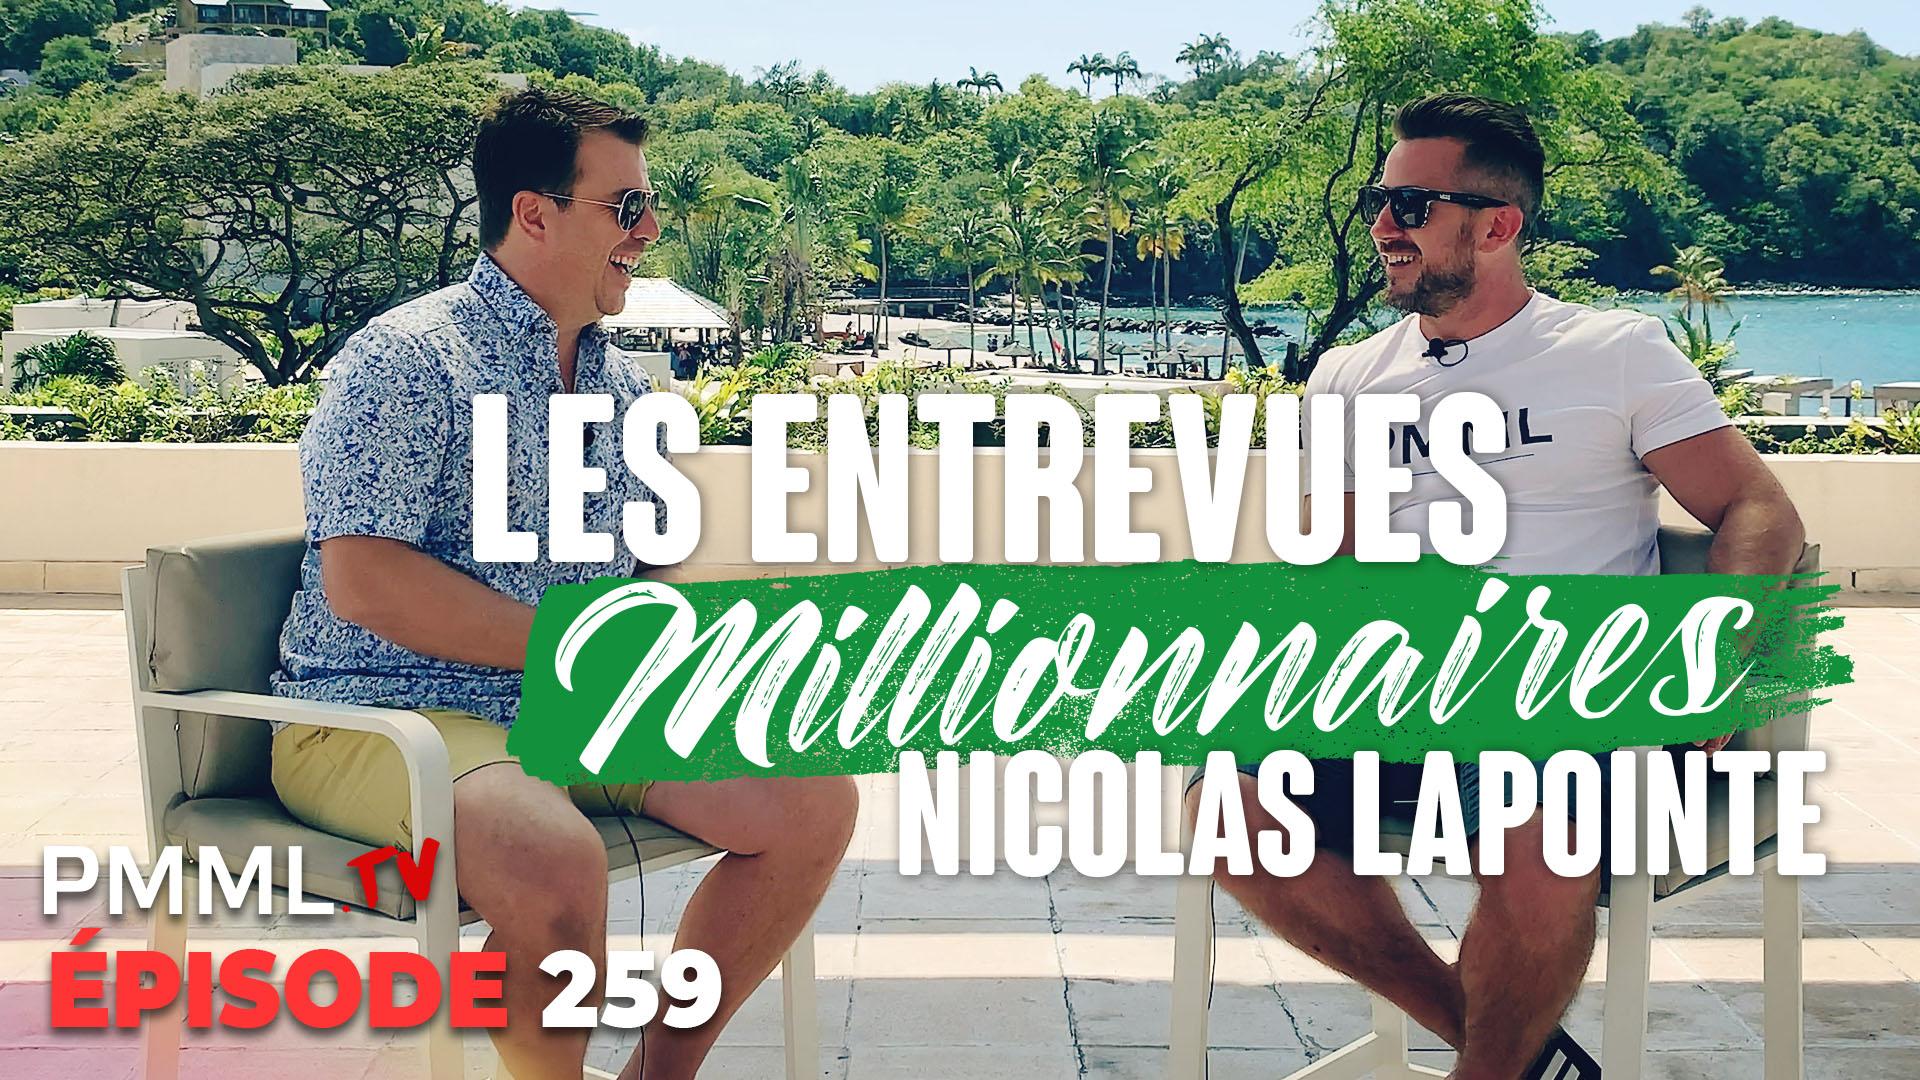 Nicolas Lapointe reçoit Nicolas Lapointe Semaine des Millionnaires